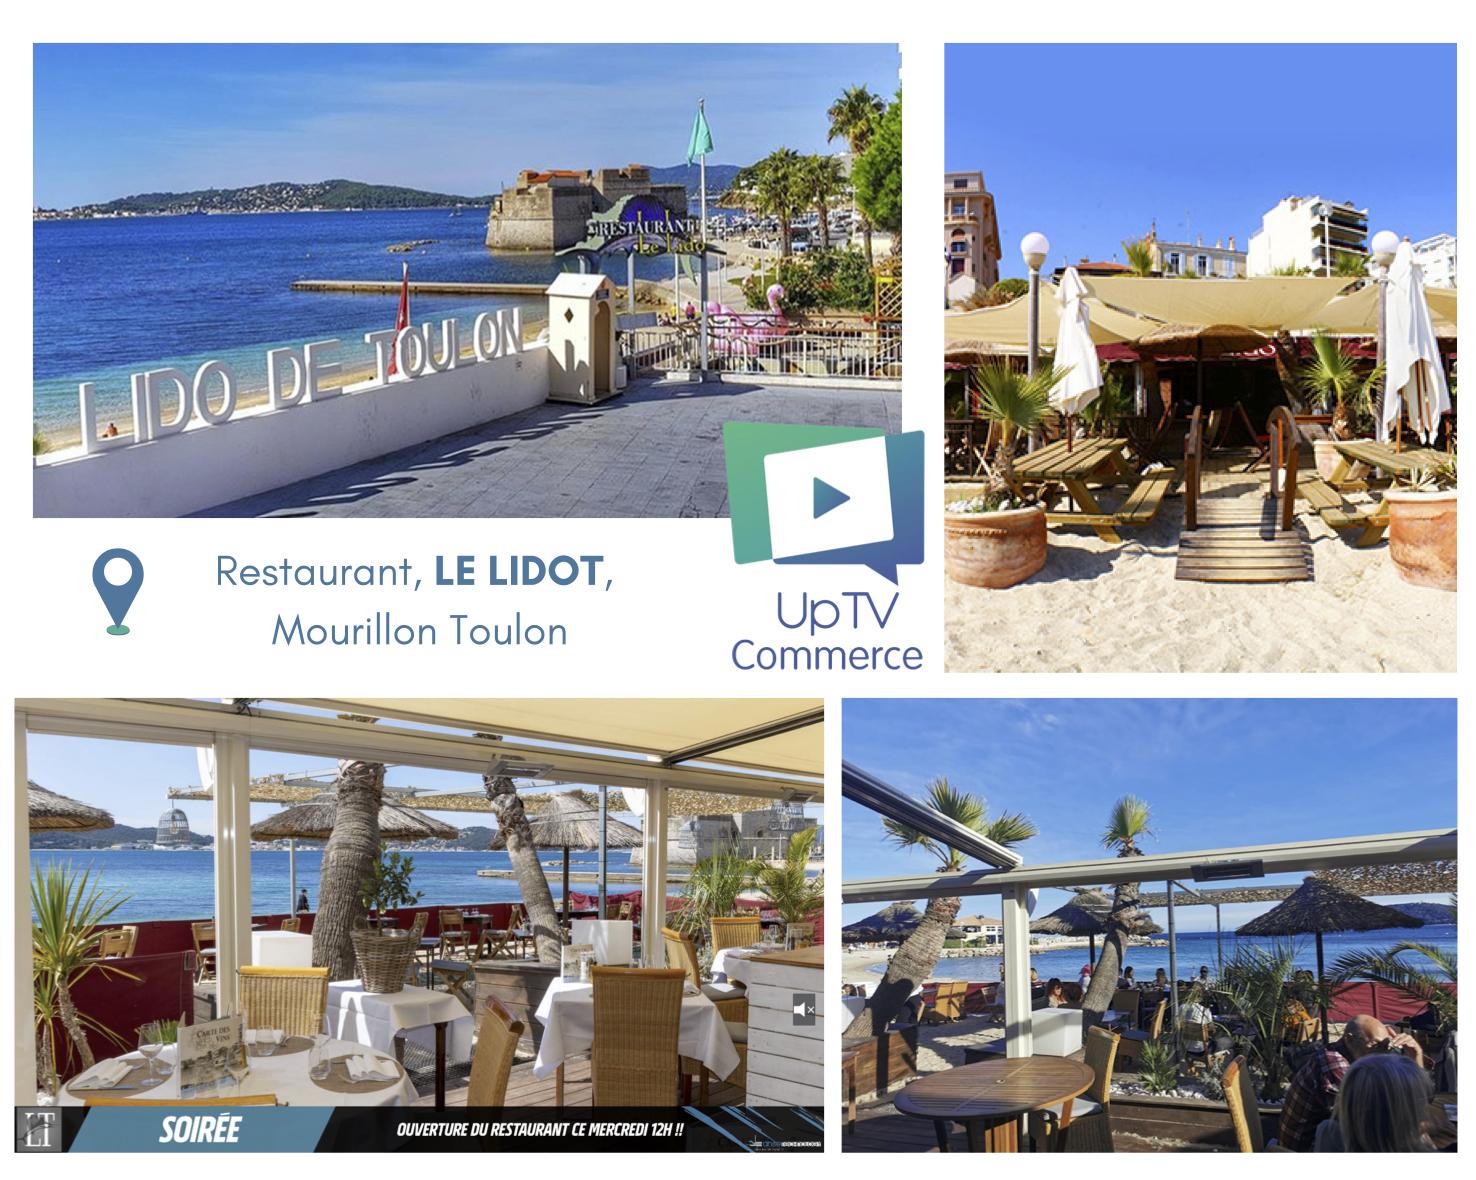 UpTV Commerce Le LIDOT restaurant, TLN Anse Technology